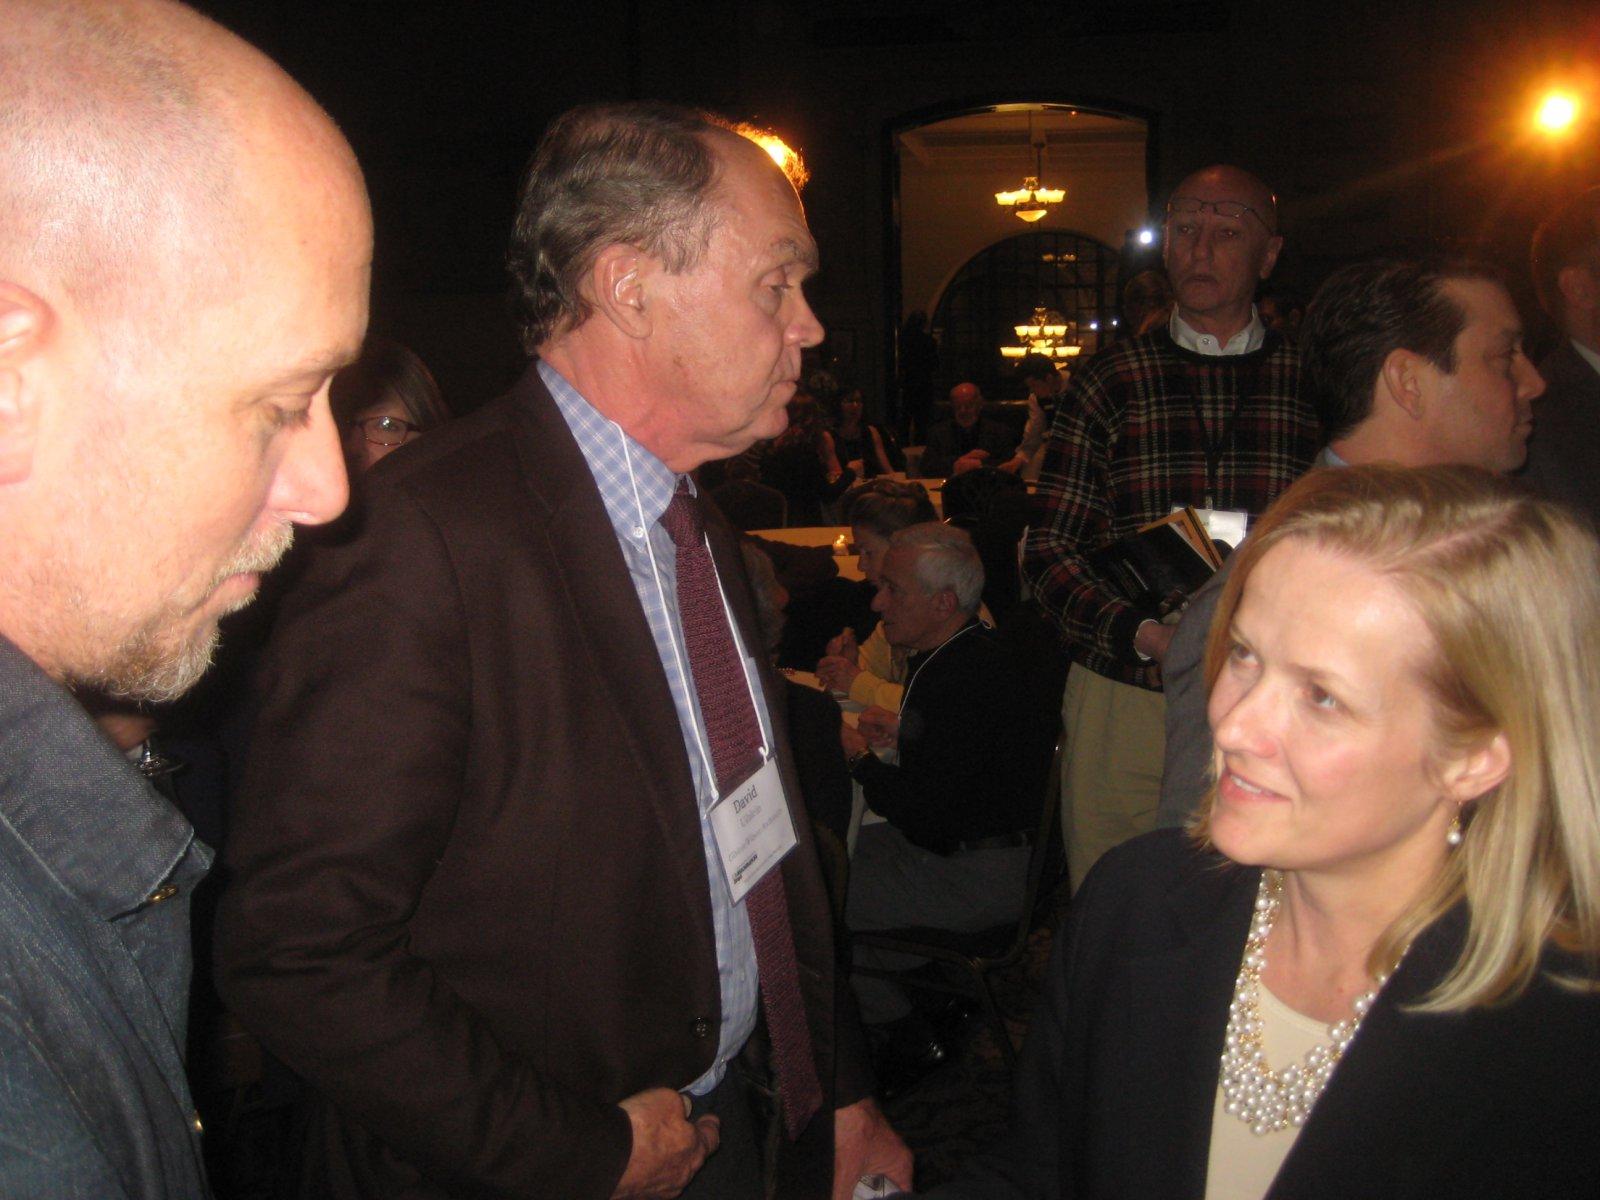 Gary Witt, David Uihlein, and Stephanie Meeks